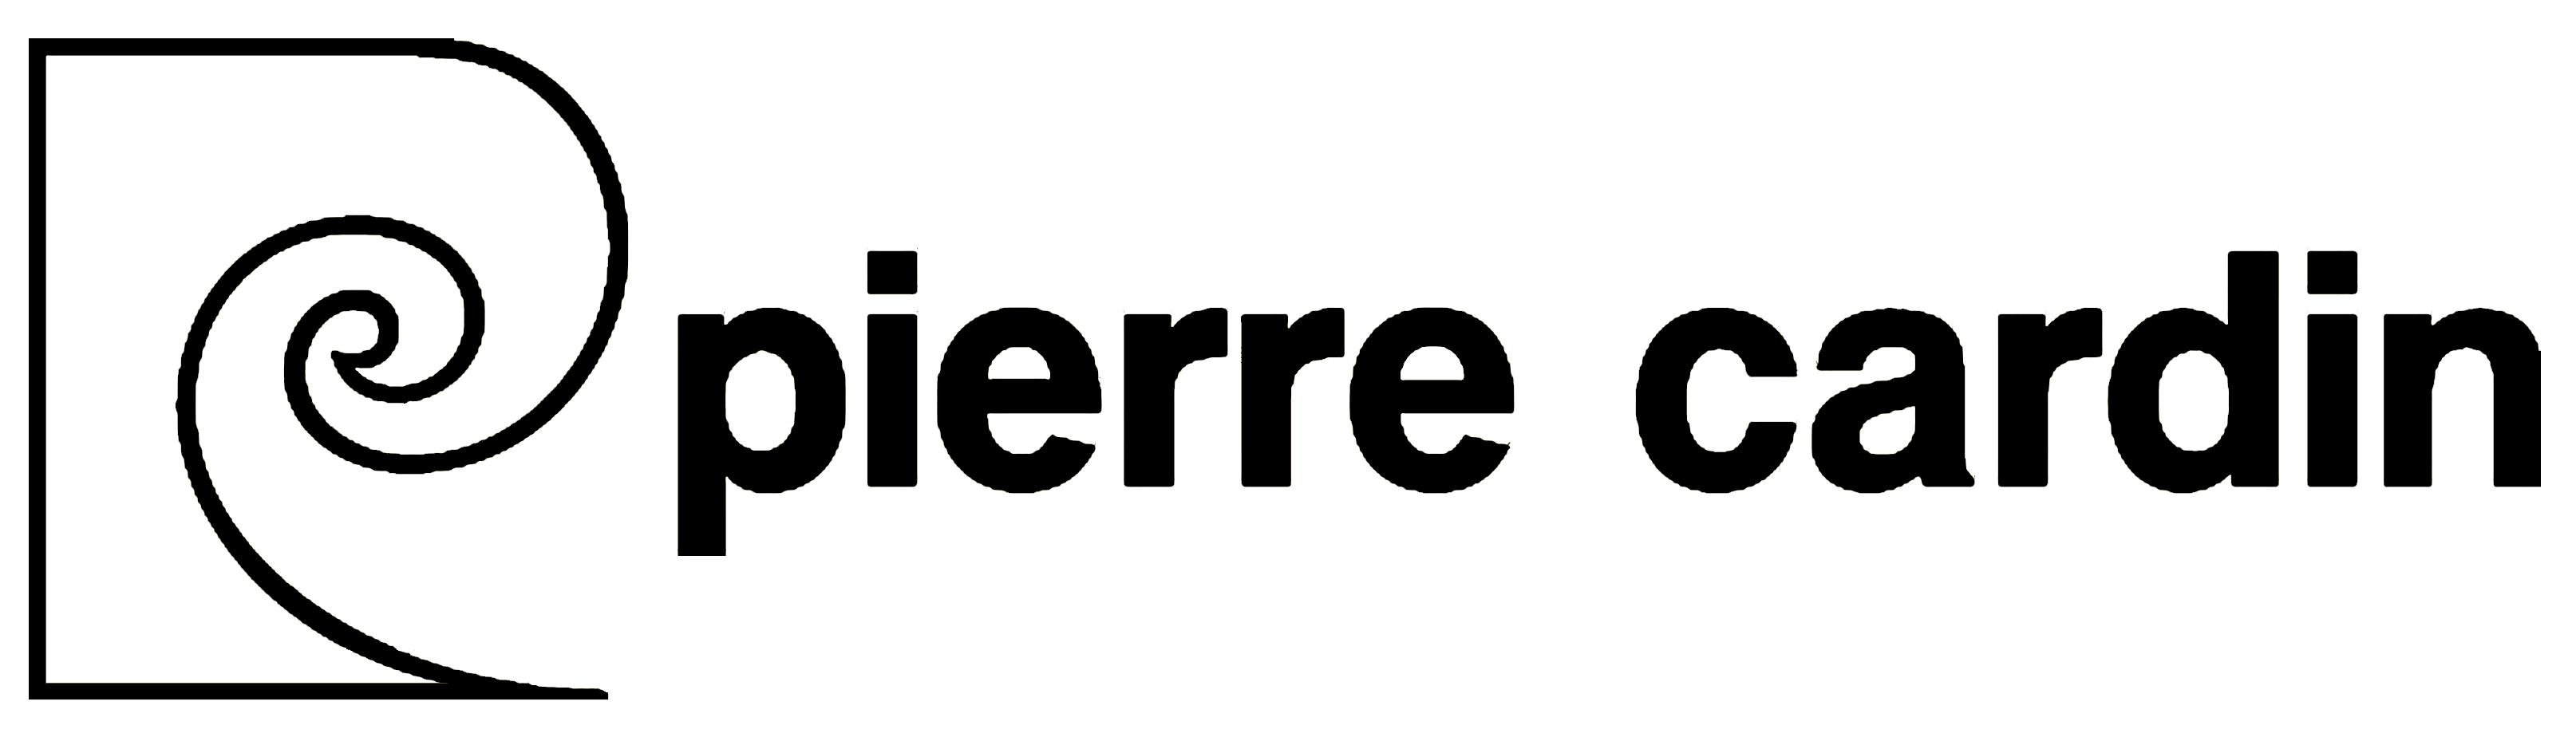 Index of wp contentuploads201603 pierre cardin logo 2012g biocorpaavc Choice Image